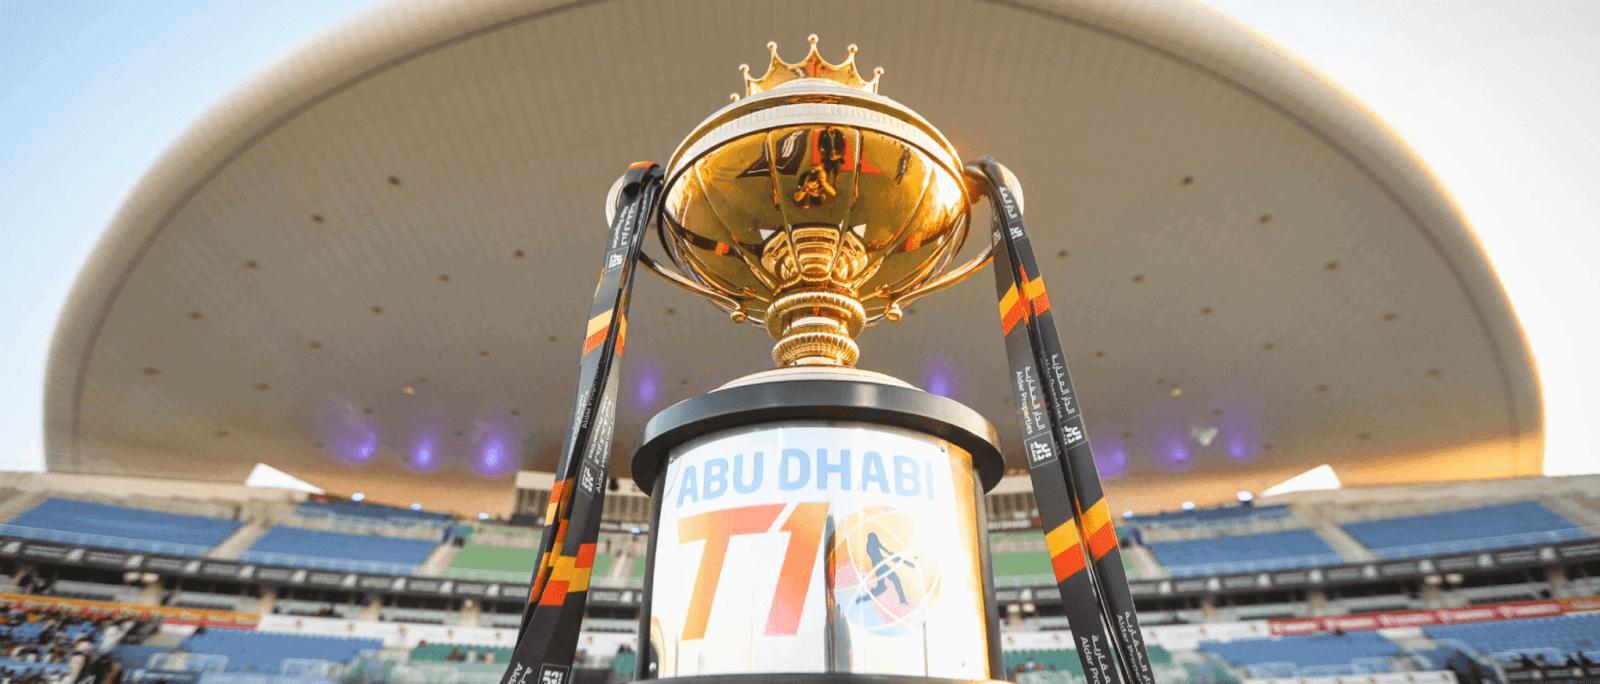 Abu Dhabi T10 League Schedule Fixture 2021